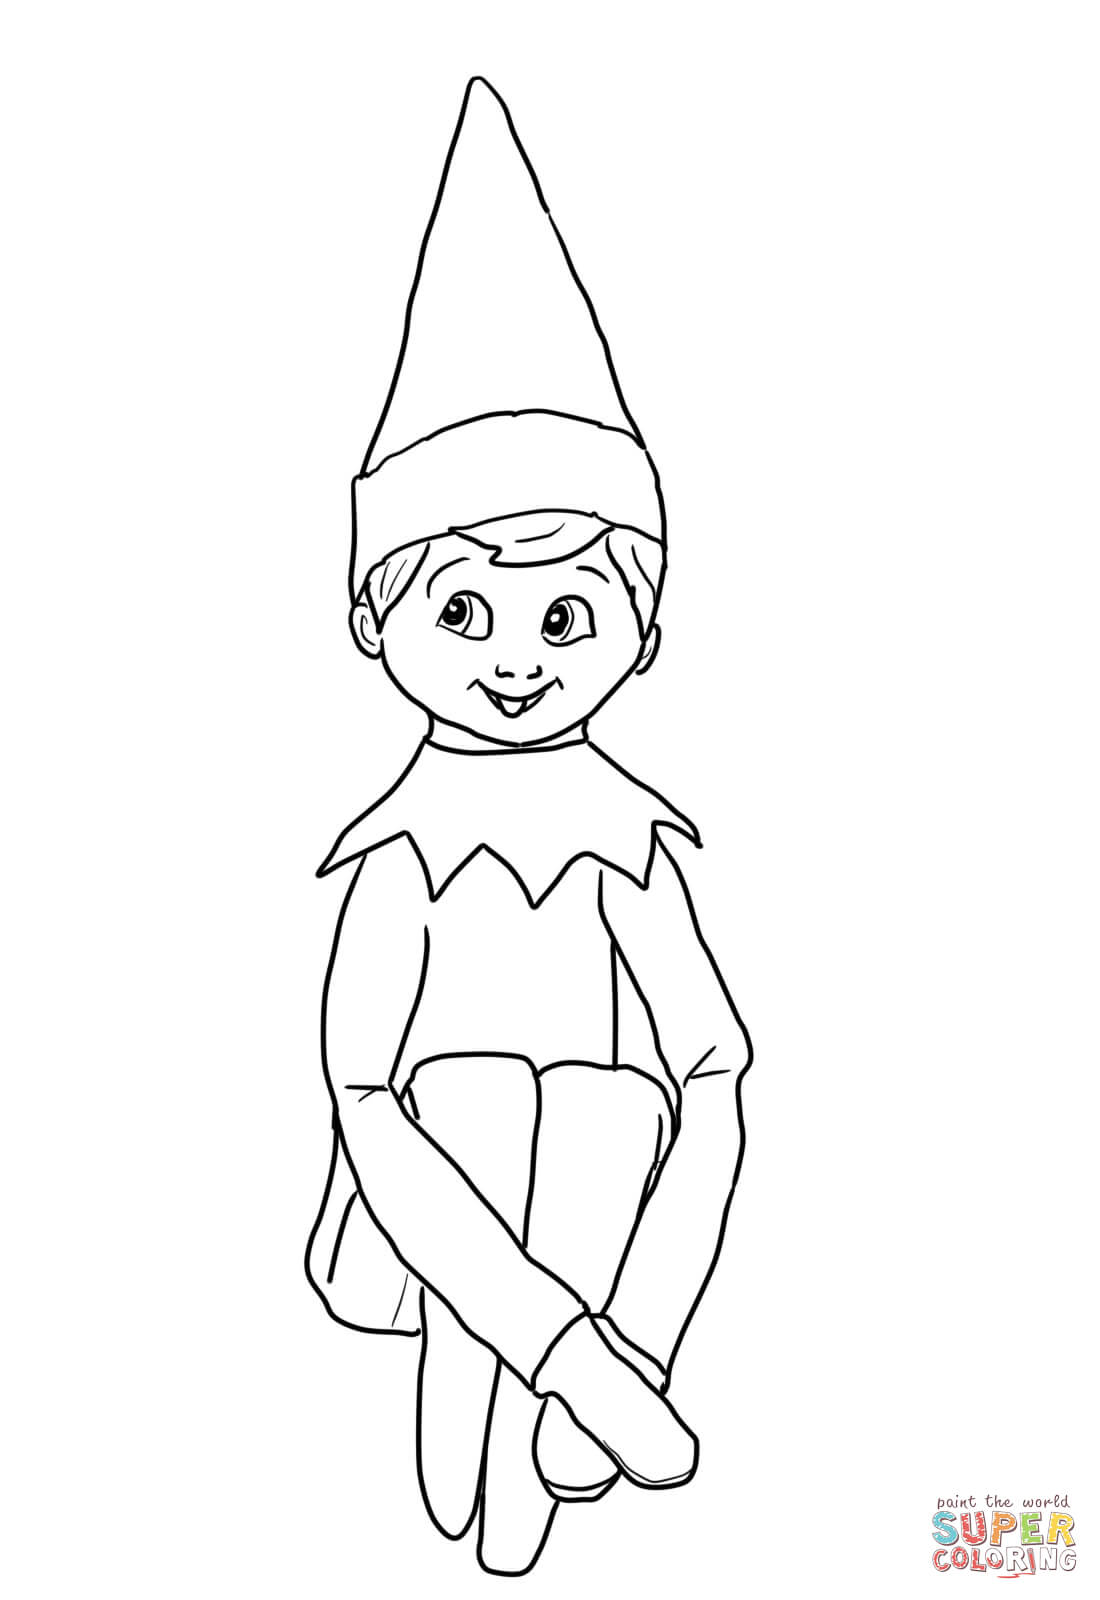 Christmas Elf On Shelf Coloring Online-Christmas Elf On Shelf Coloring Online-2